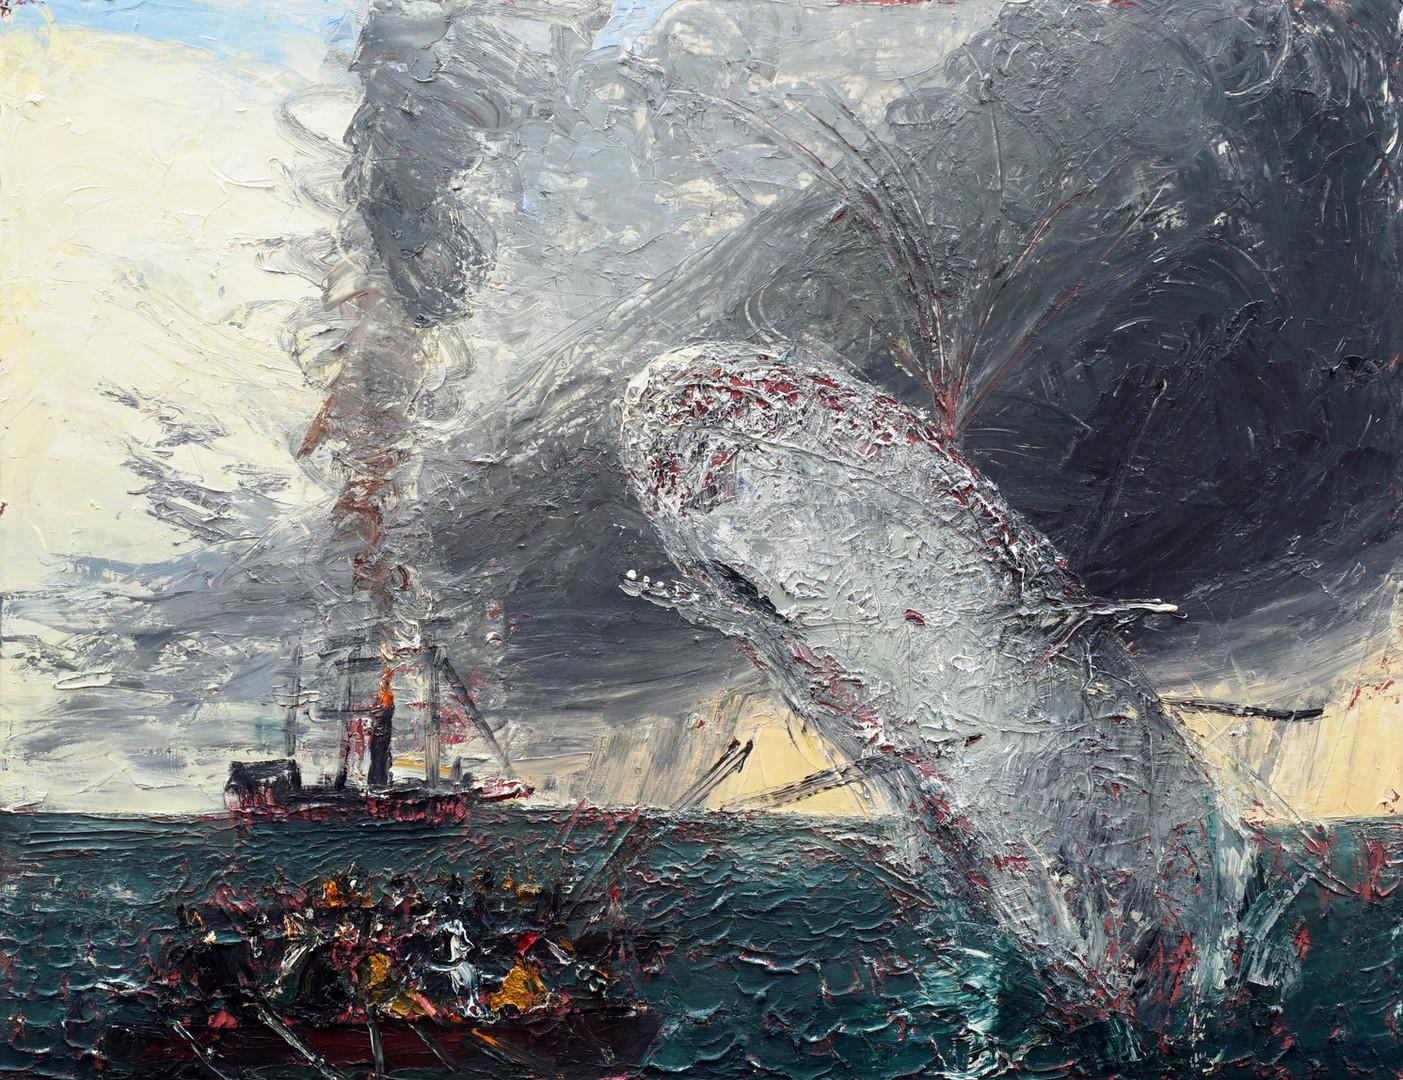 JOHN BRADFORD Moby Dick, 2019 acrylic, oil on canvas 60 x 78 in (152.4 x 198.1 cm)